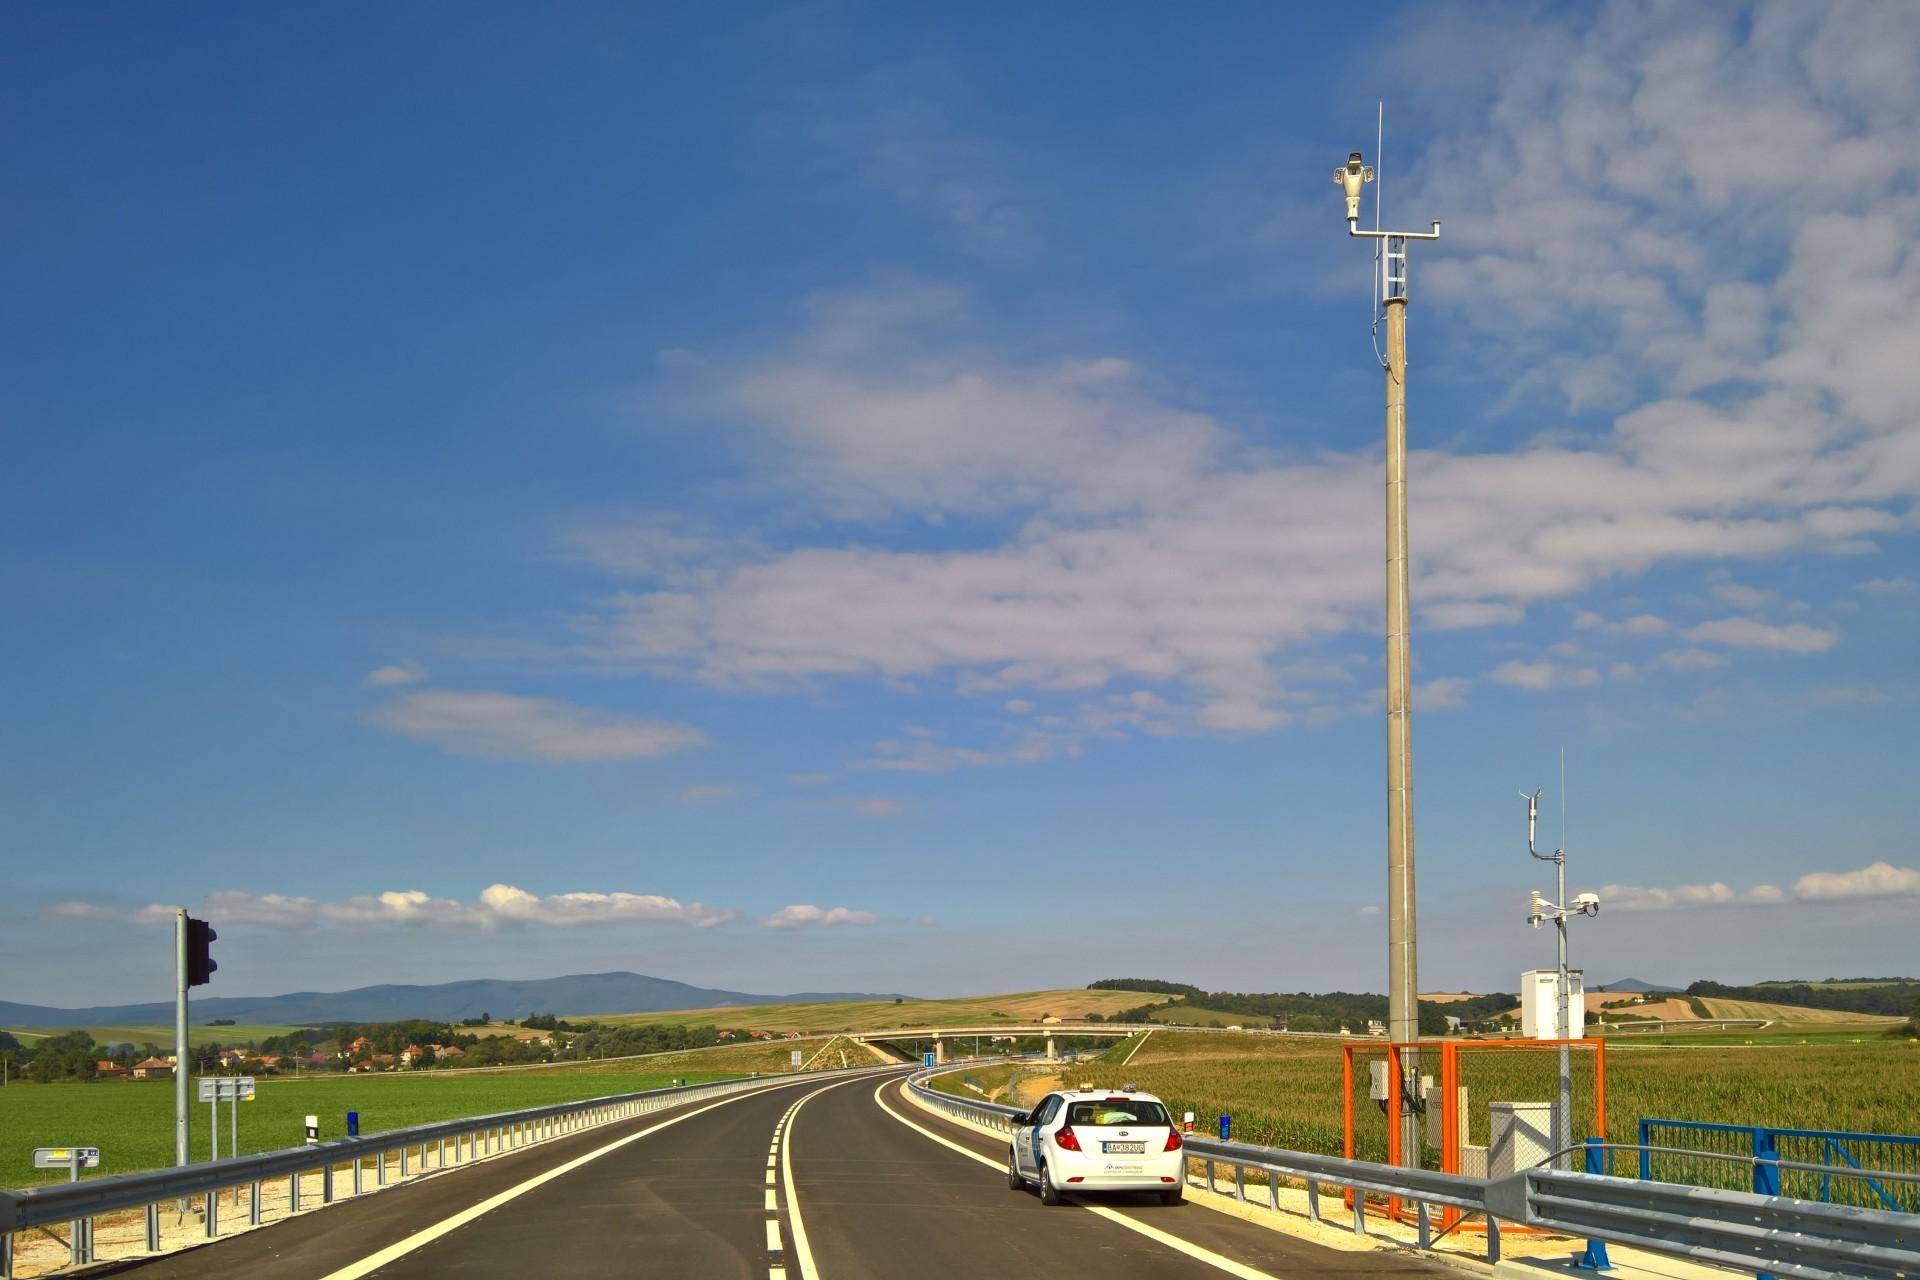 Highway R2 Ruskovce – Pravotice